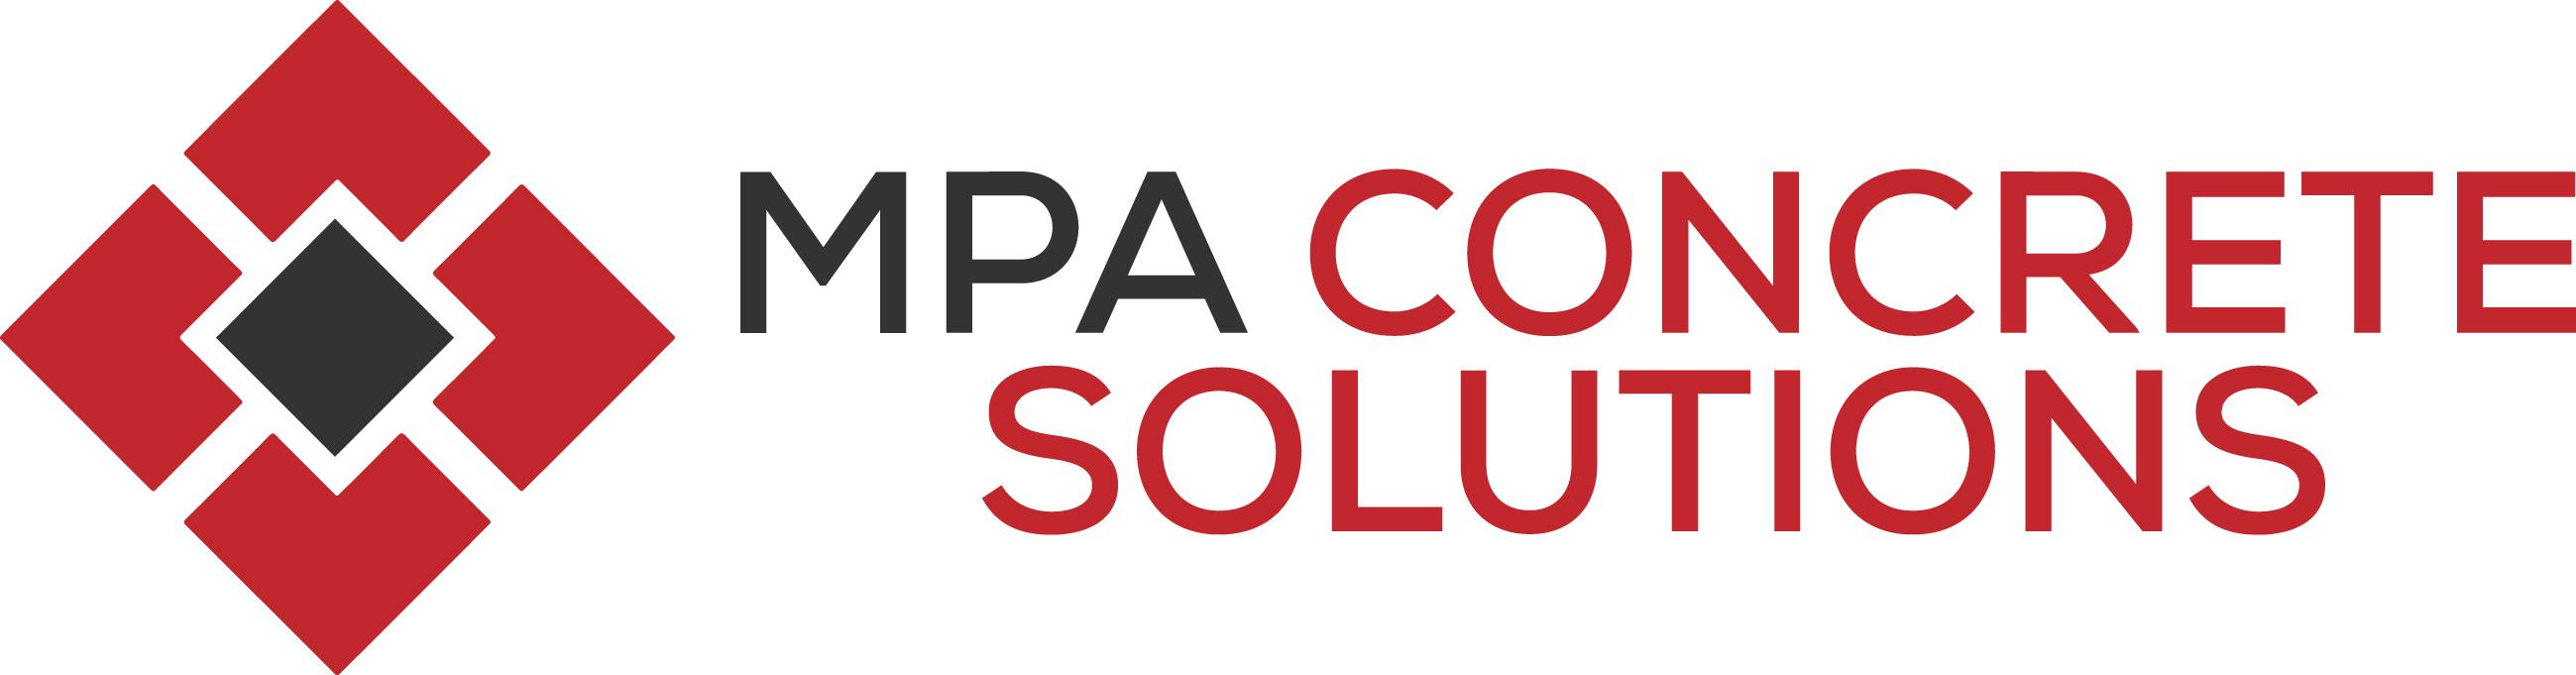 MPA Concrete Solutions's Logo